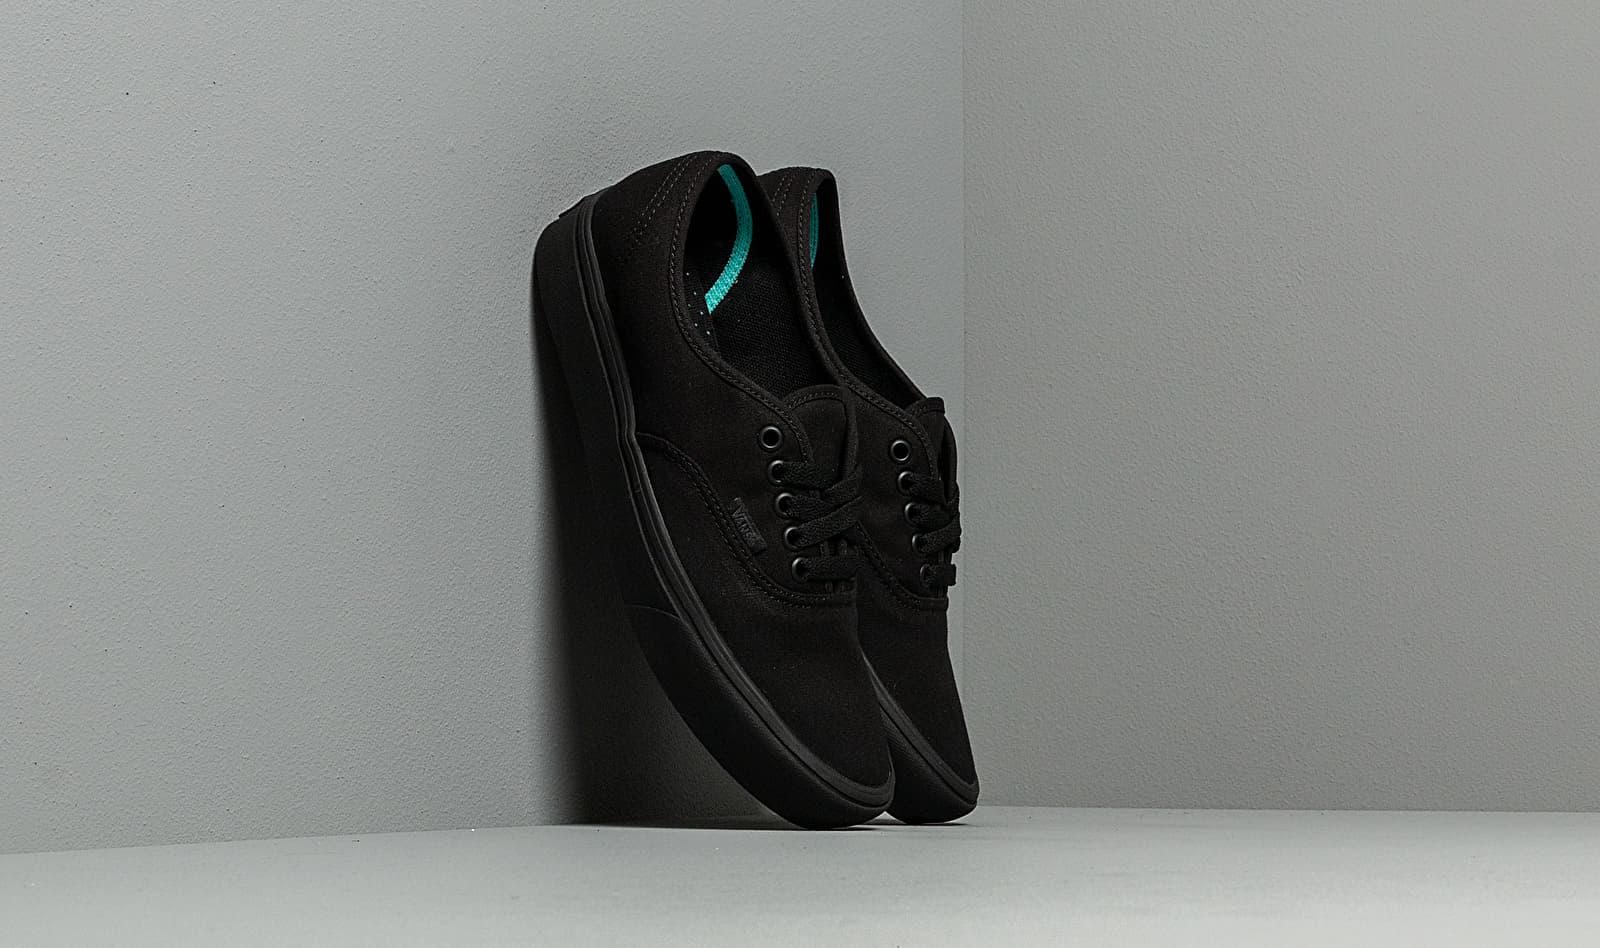 Vans ComfyCush Authentic (Classic) Black/ Black VN0A3WM7VND1